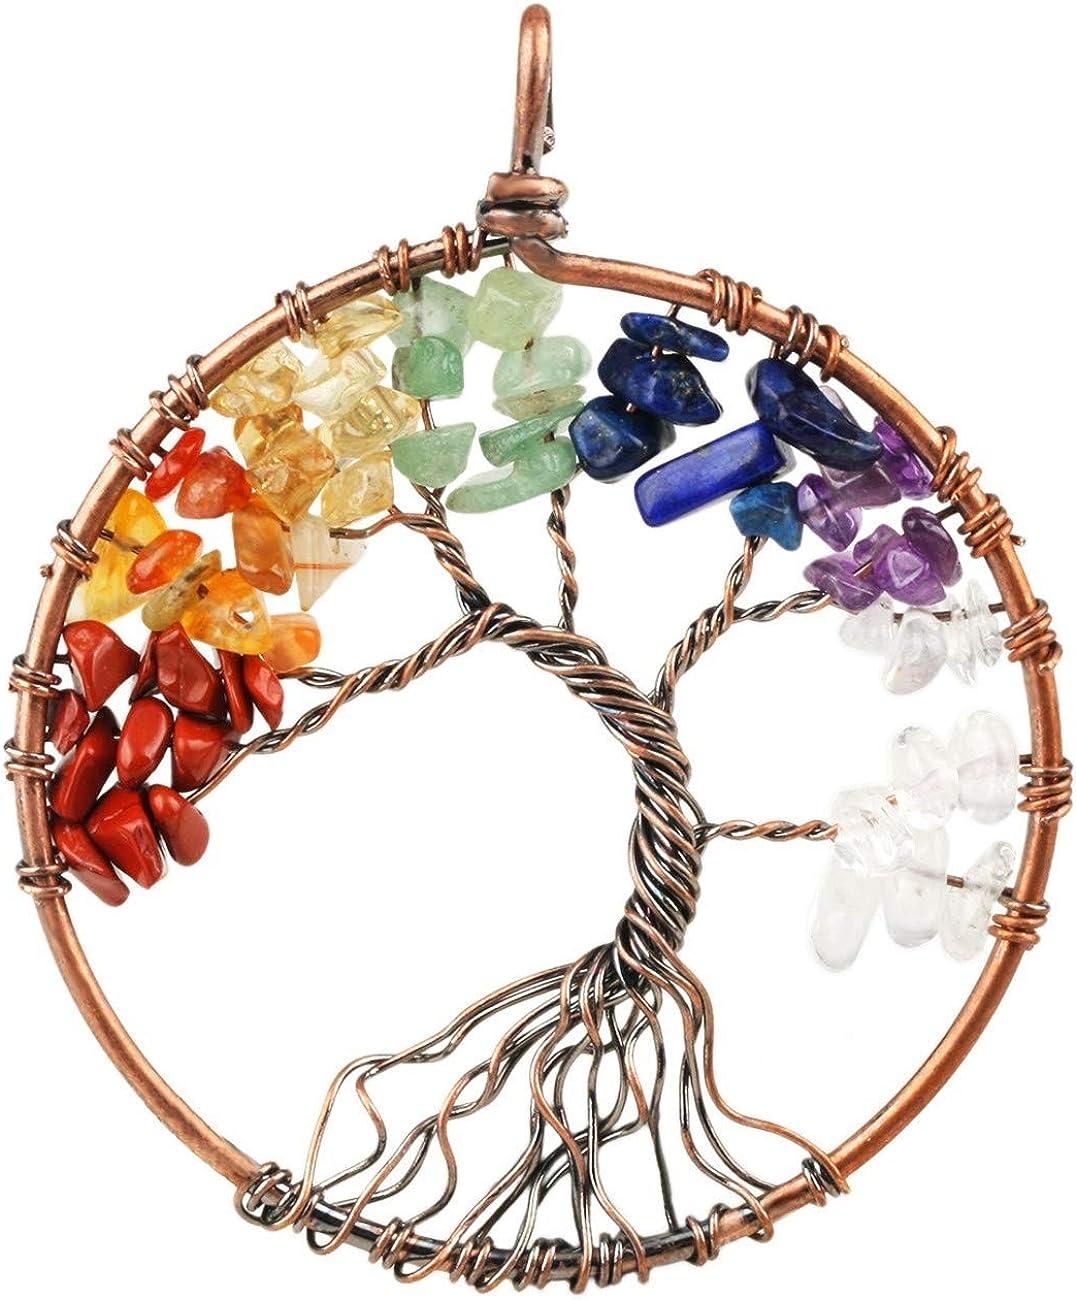 Crystal Rainbow Pendant Necklace 7 Chakras Gemstone Chips Antique Bronze Wire Wrap